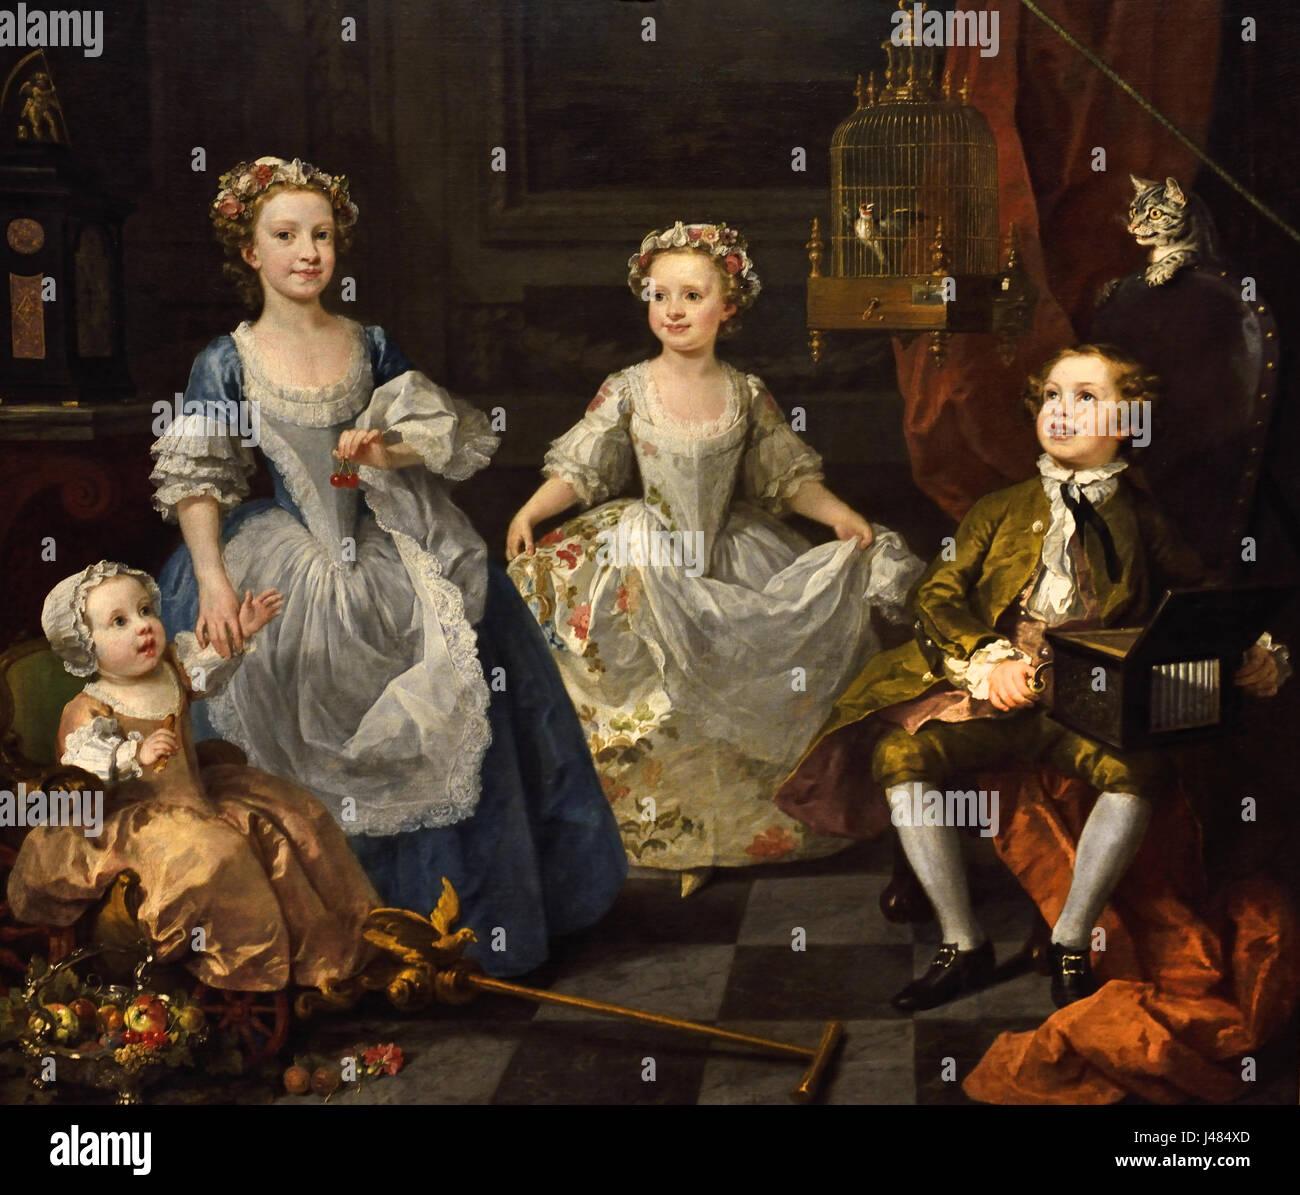 The Graham Children 1742 William Hogarth 1697-1764 English England - Stock Image